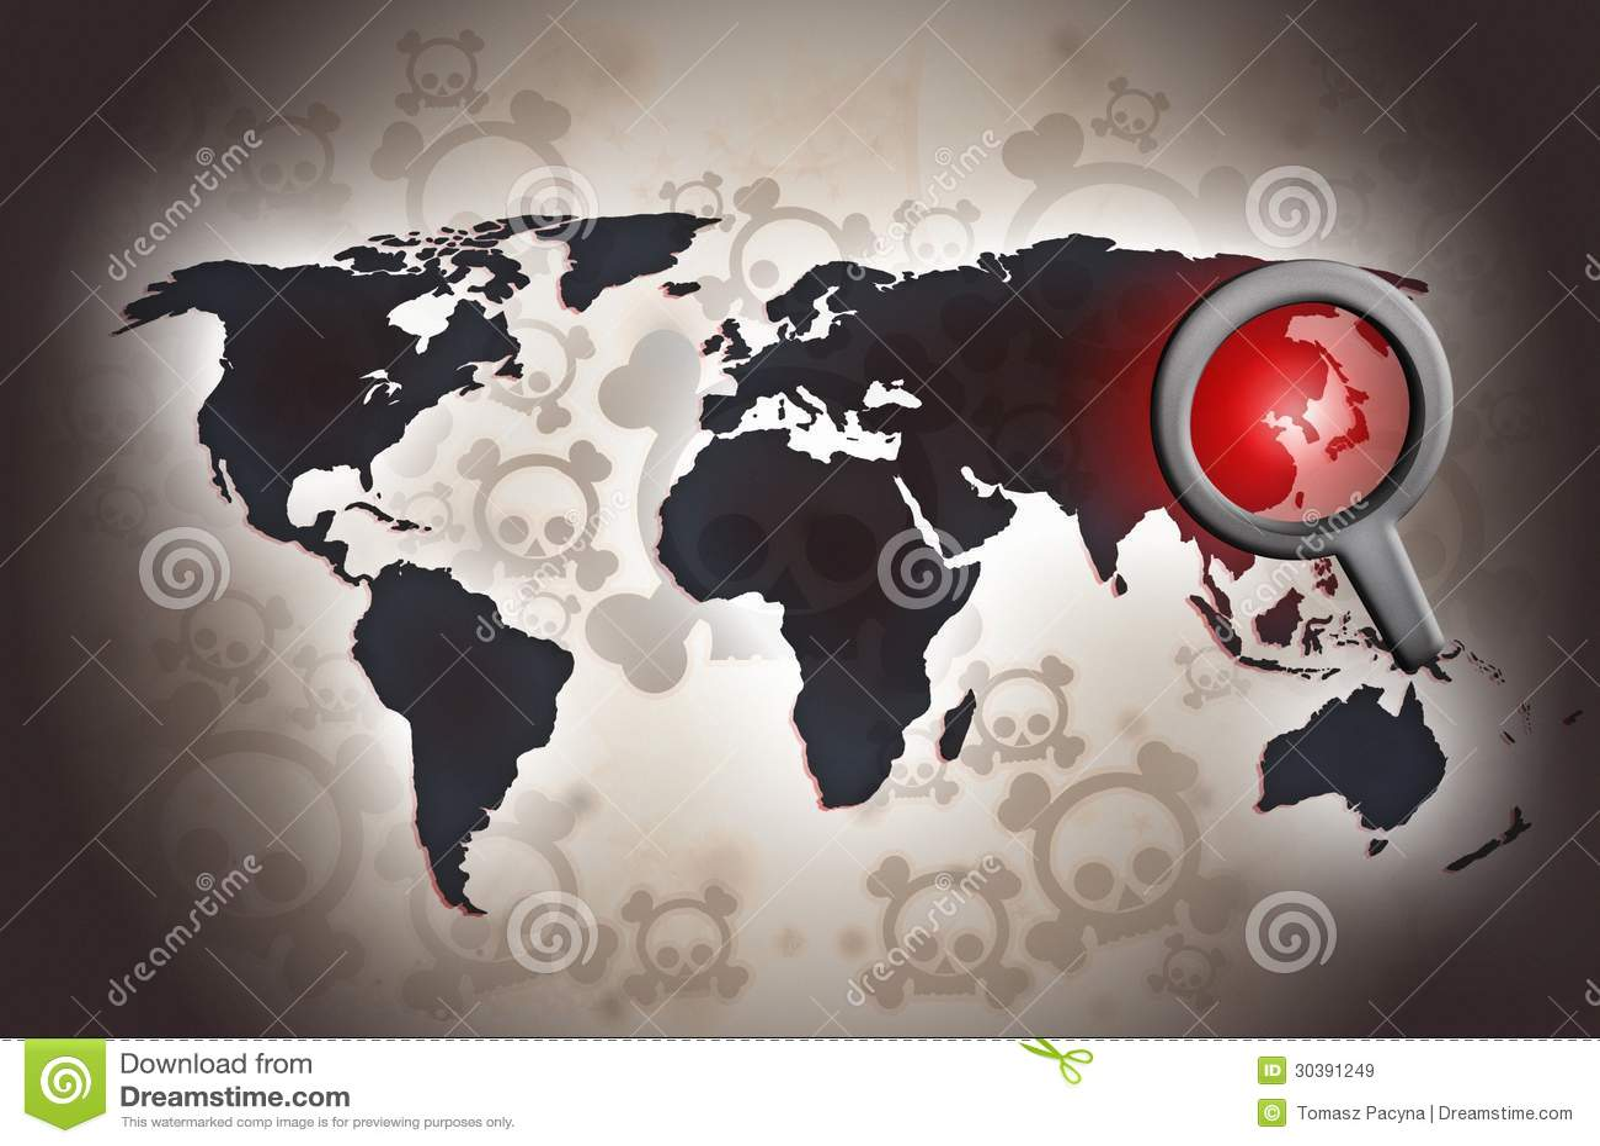 North korean conflict fear illustration